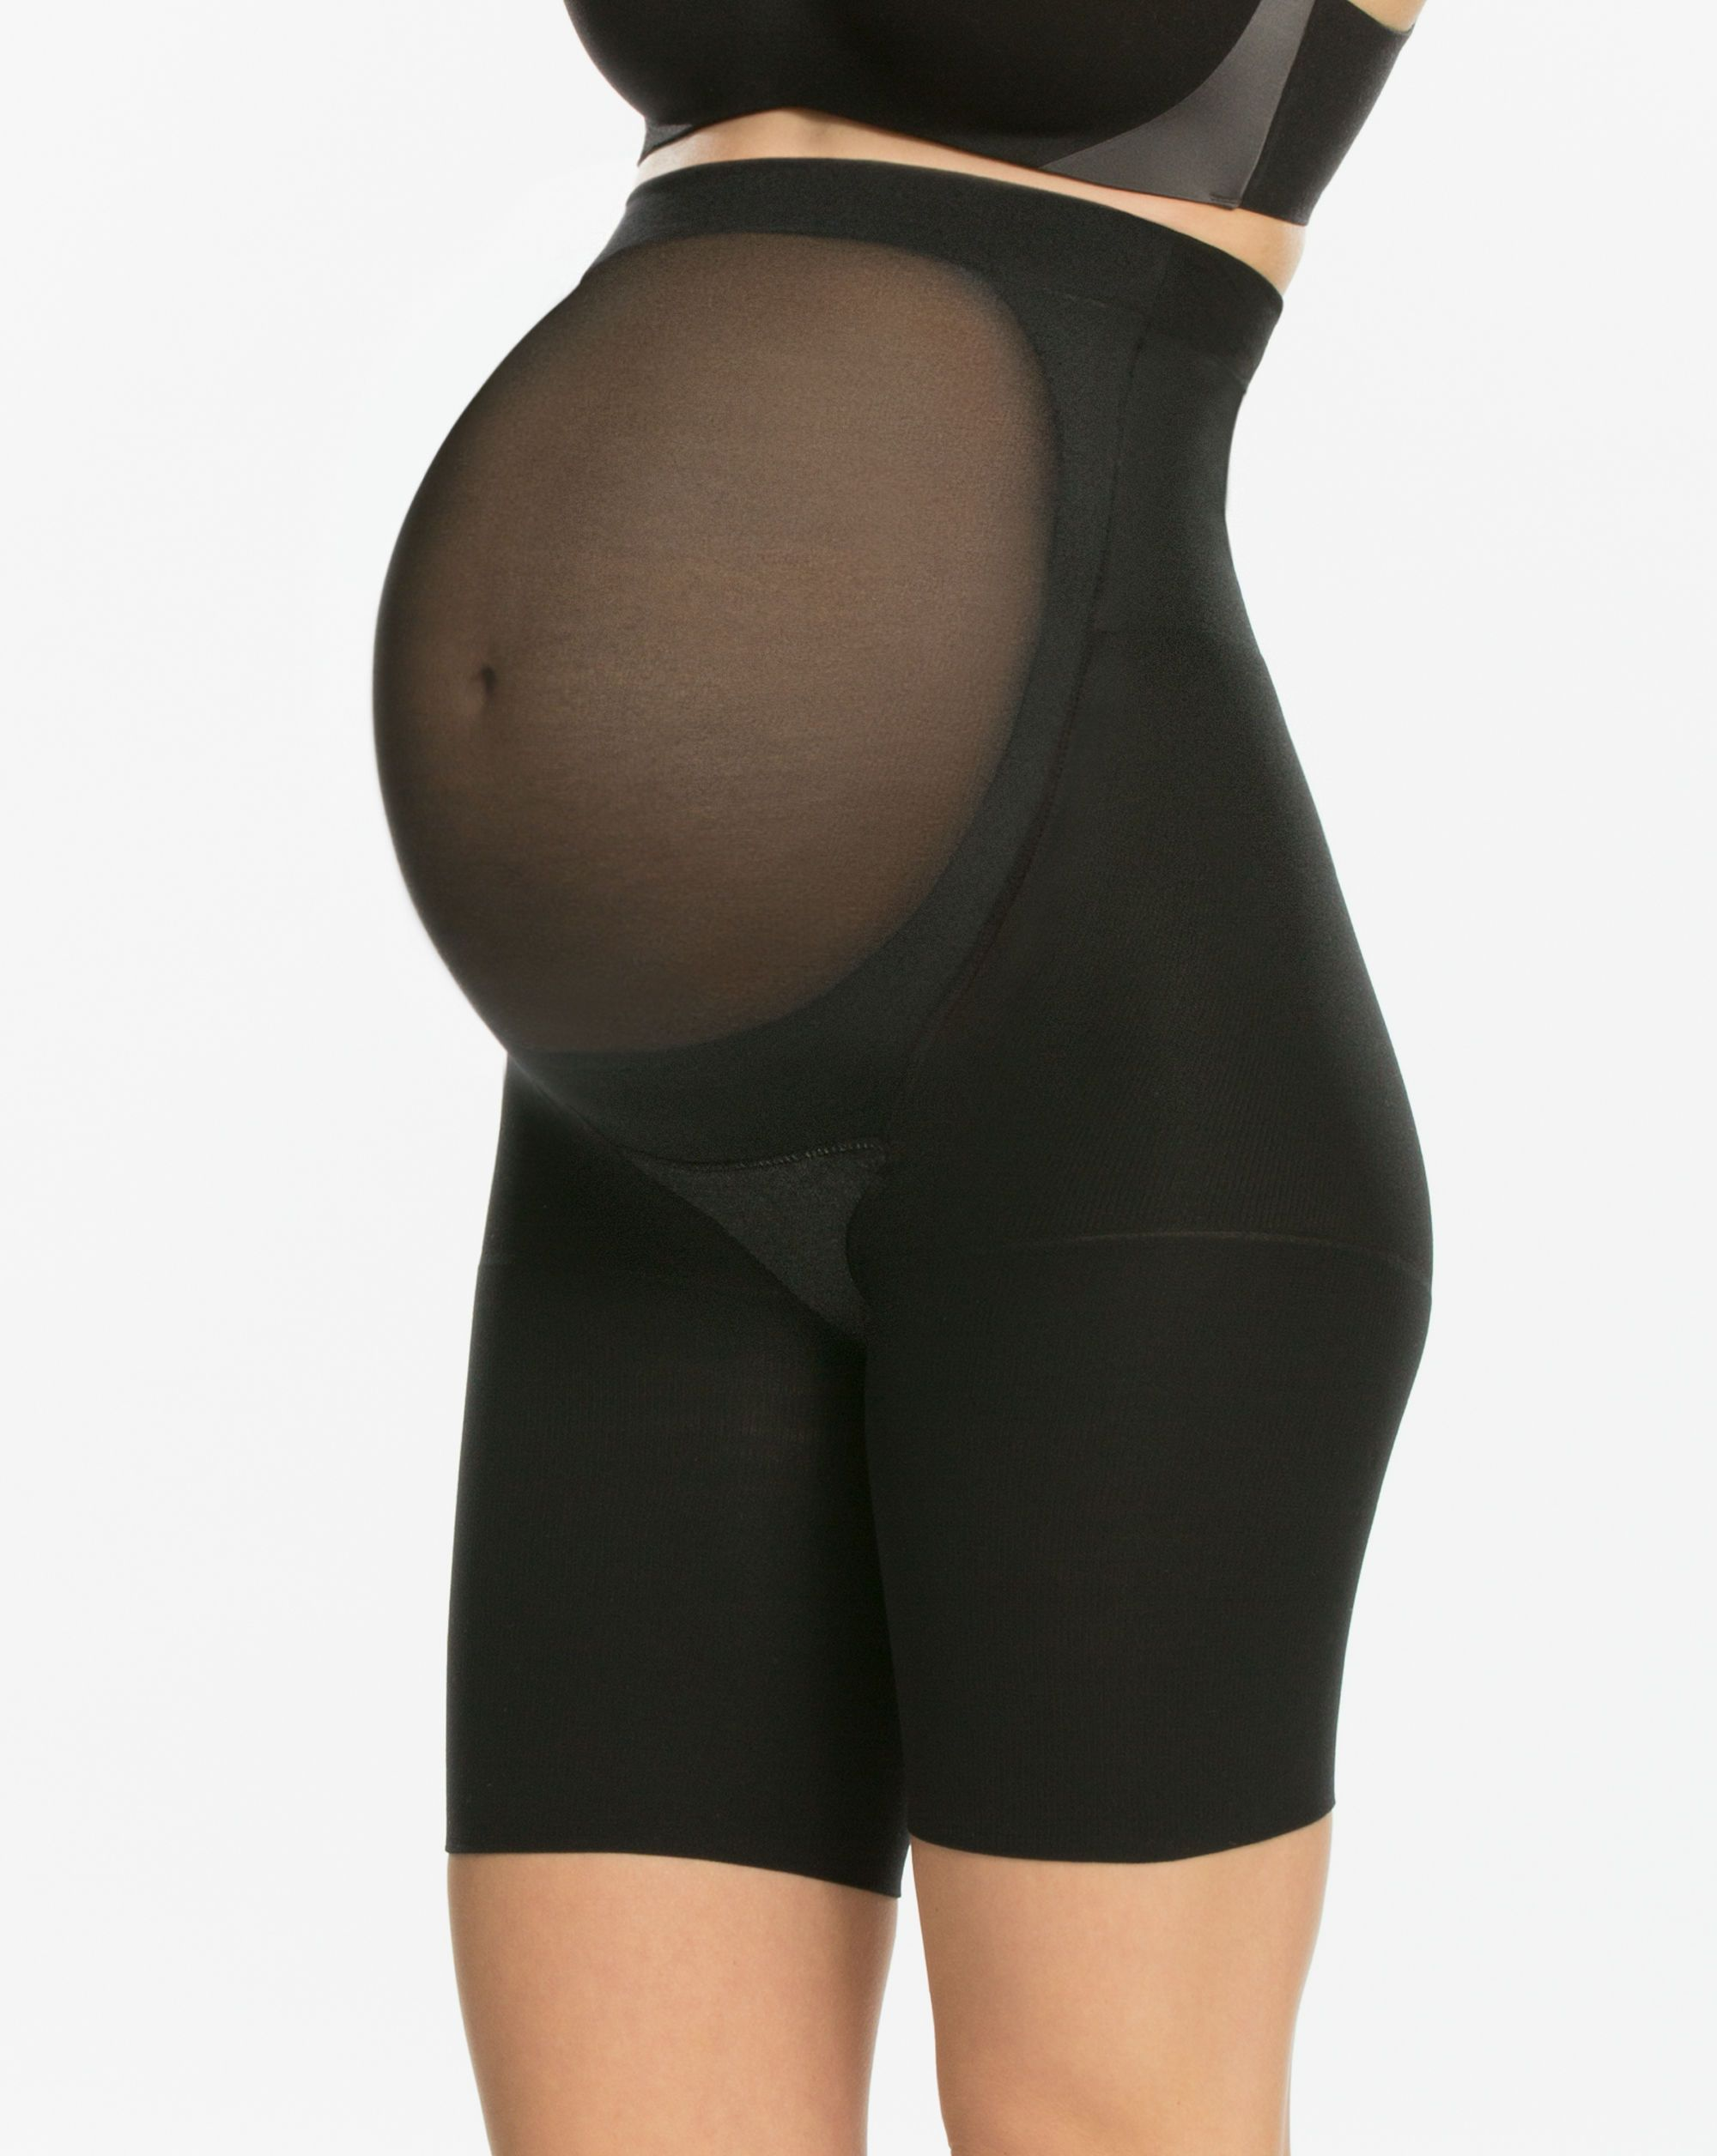 45907dba843cb1 Home > Mama > Power Mama Maternity Mid-Thigh Shaper